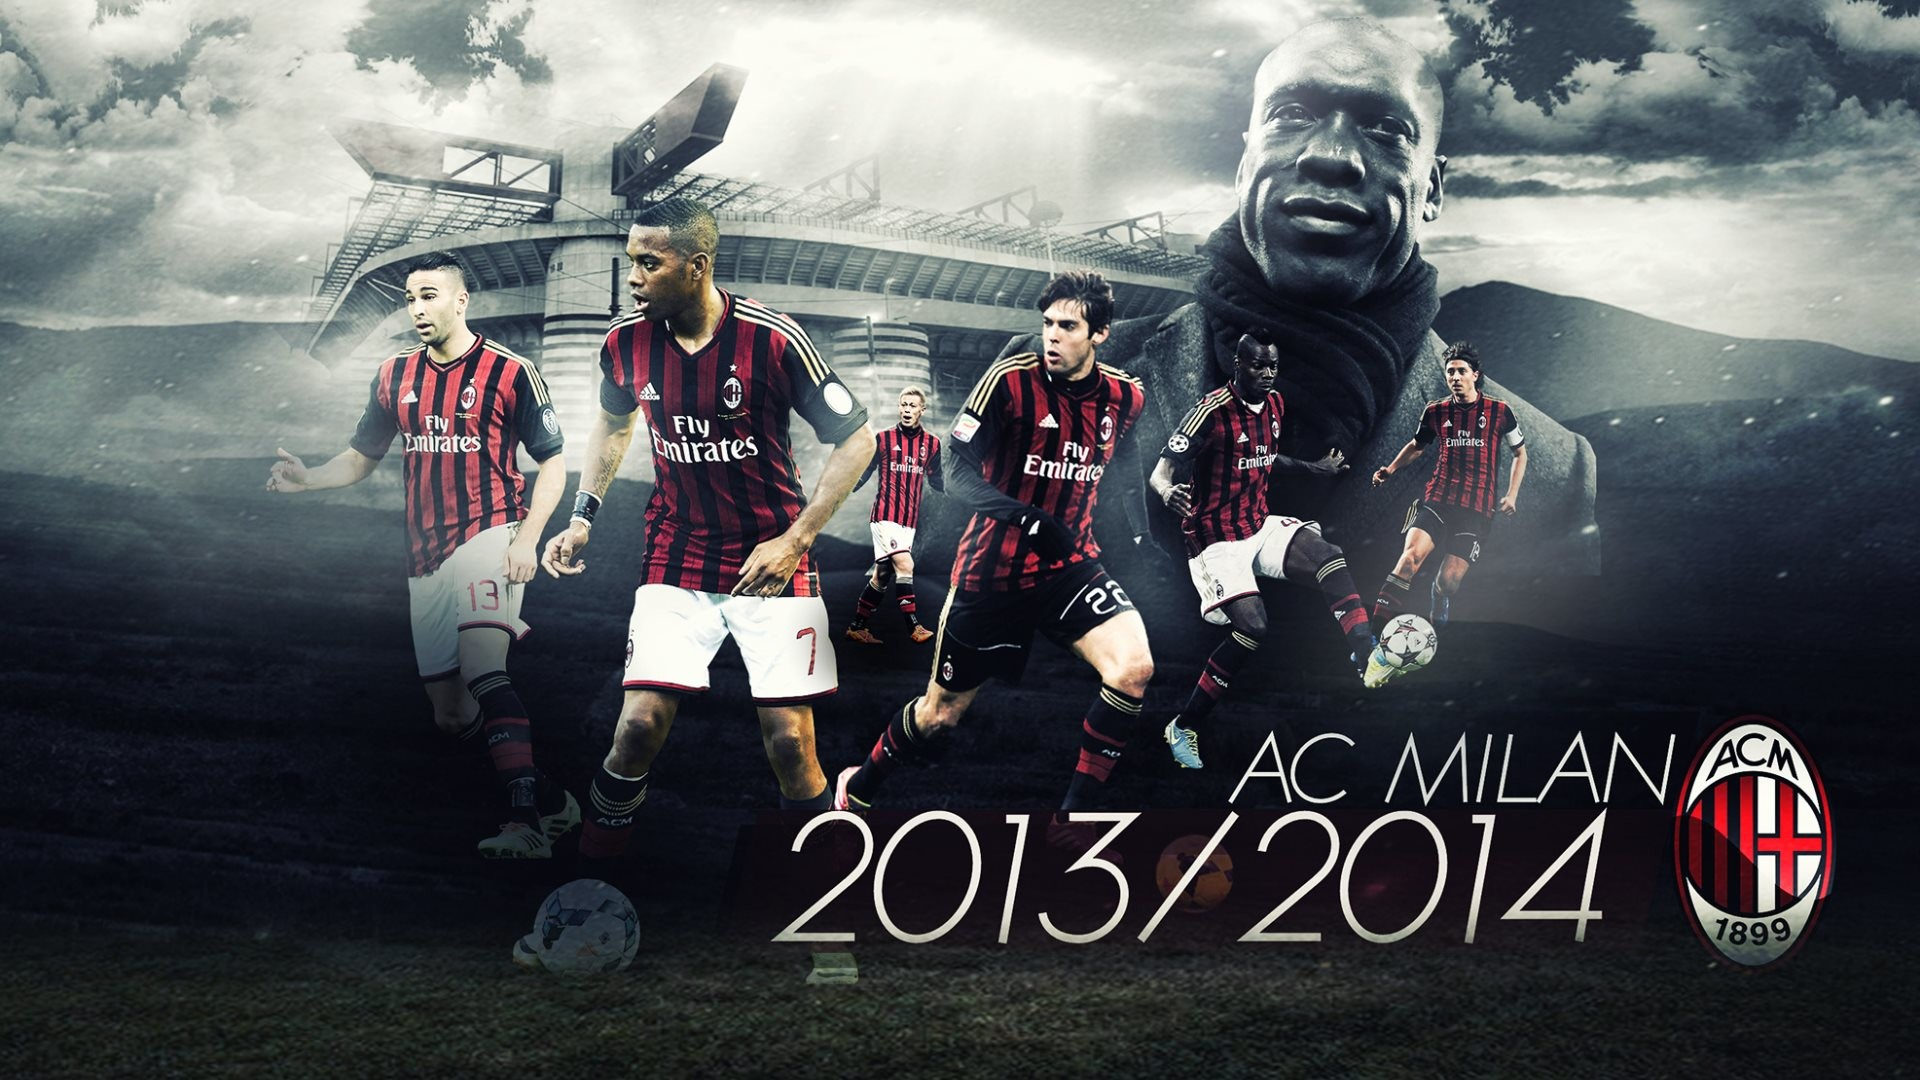 HD AC Milan 2014 4k Pics for Computer